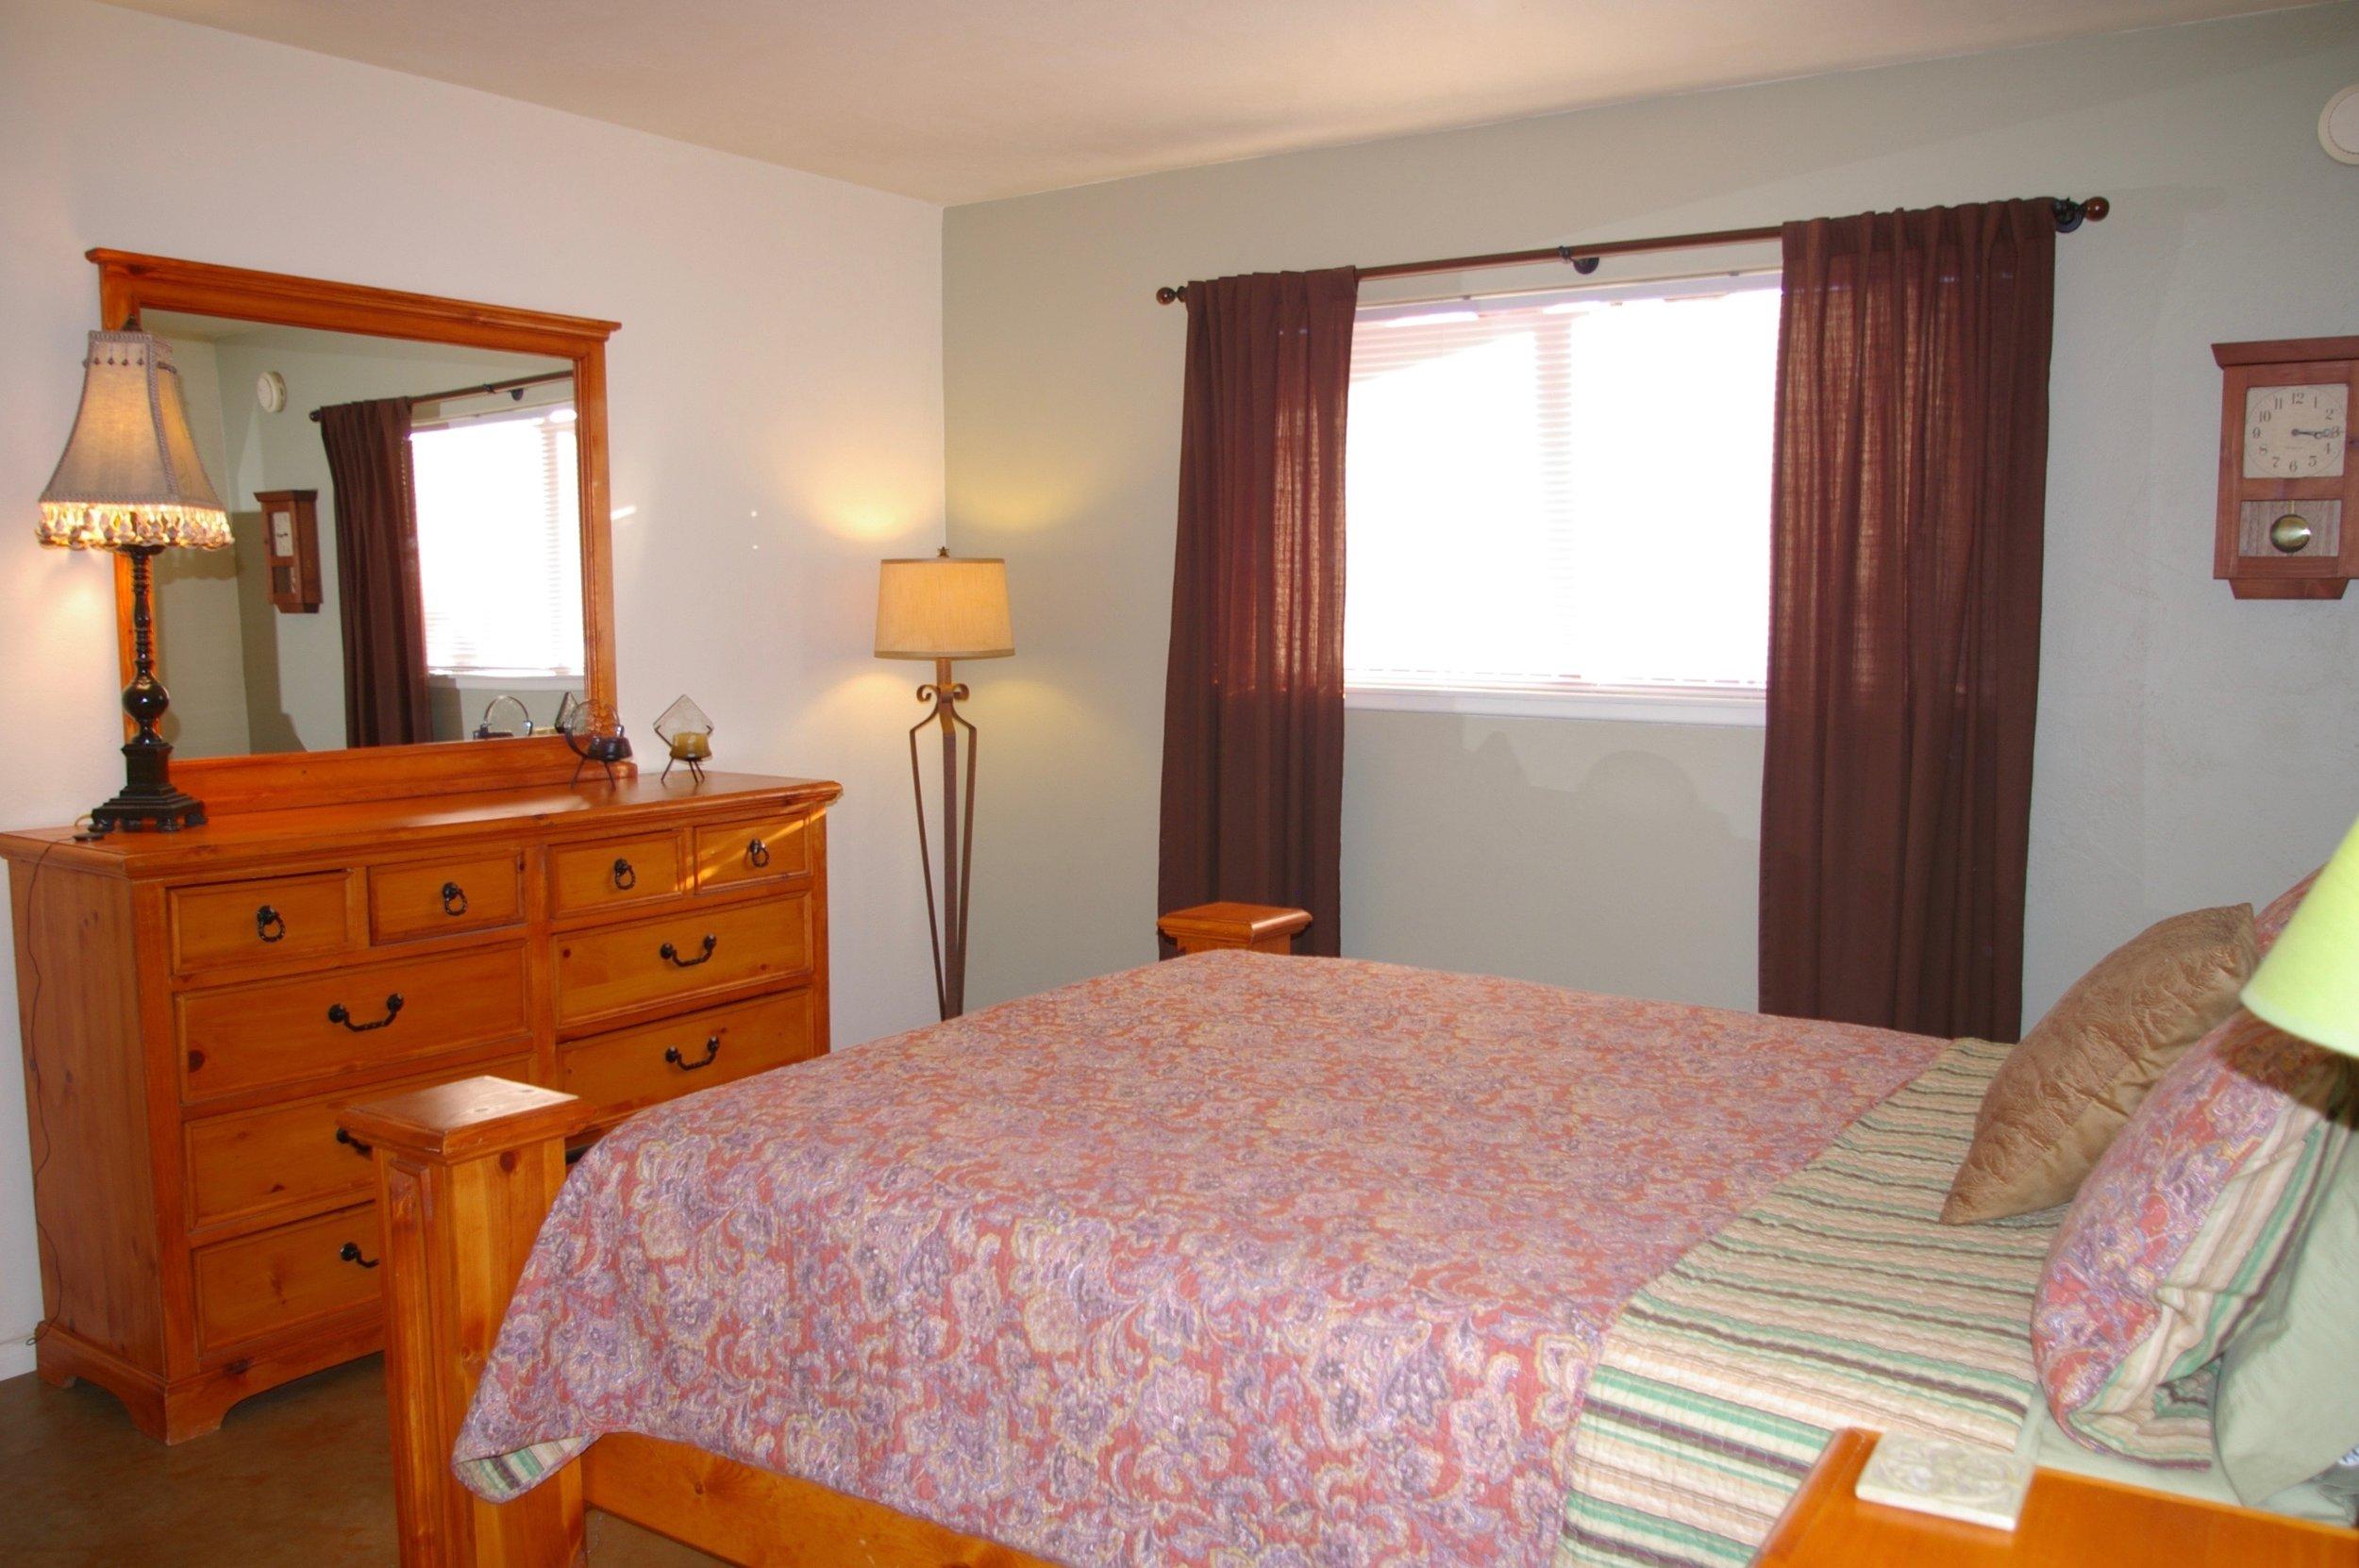 Rent29 Cactus West Master Bed Room